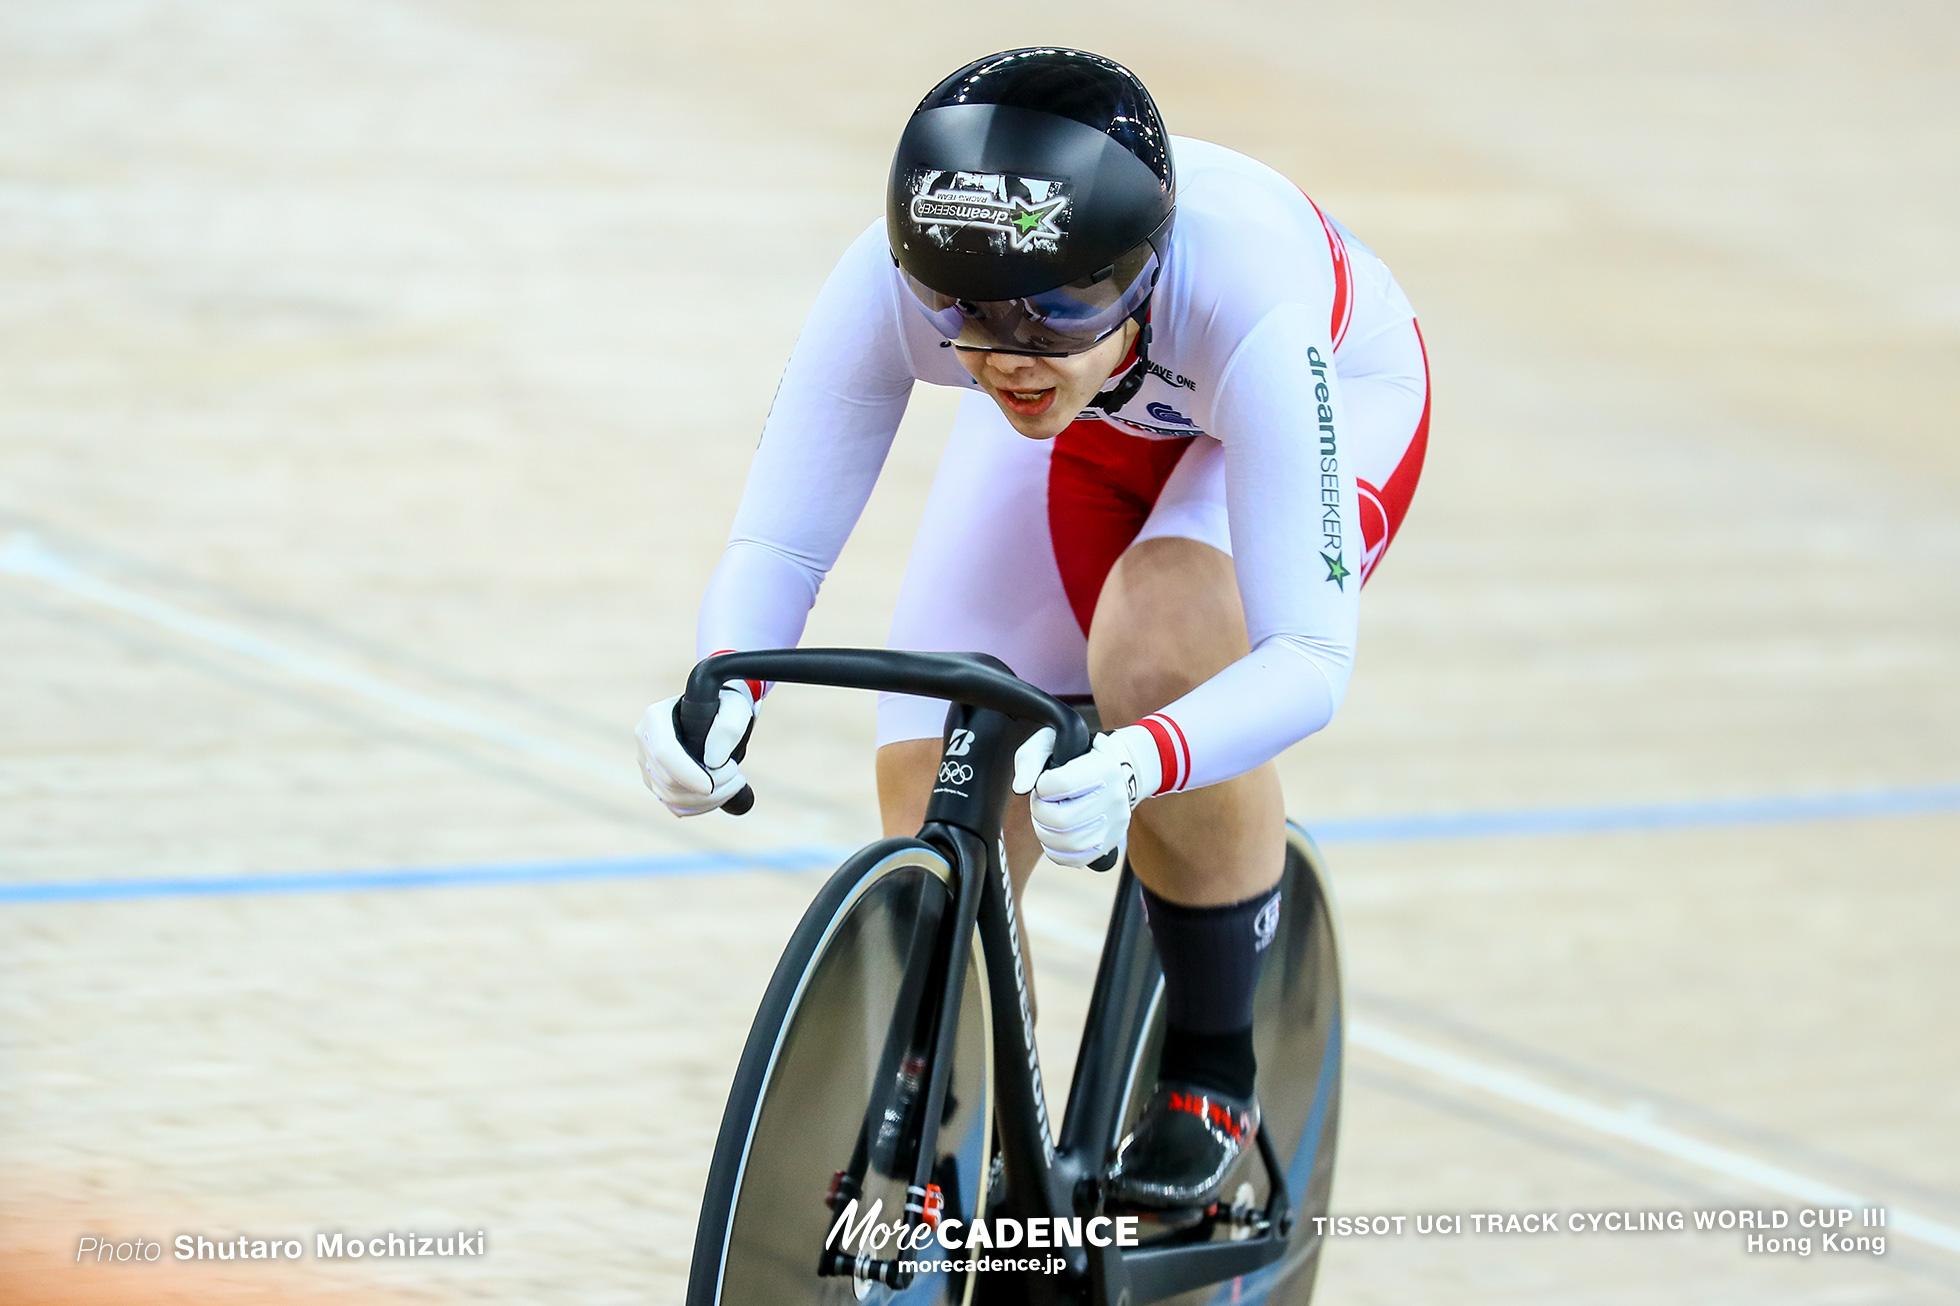 Qualifying / Women's Sprint / TISSOT UCI TRACK CYCLING WORLD CUP III, Hong Kong